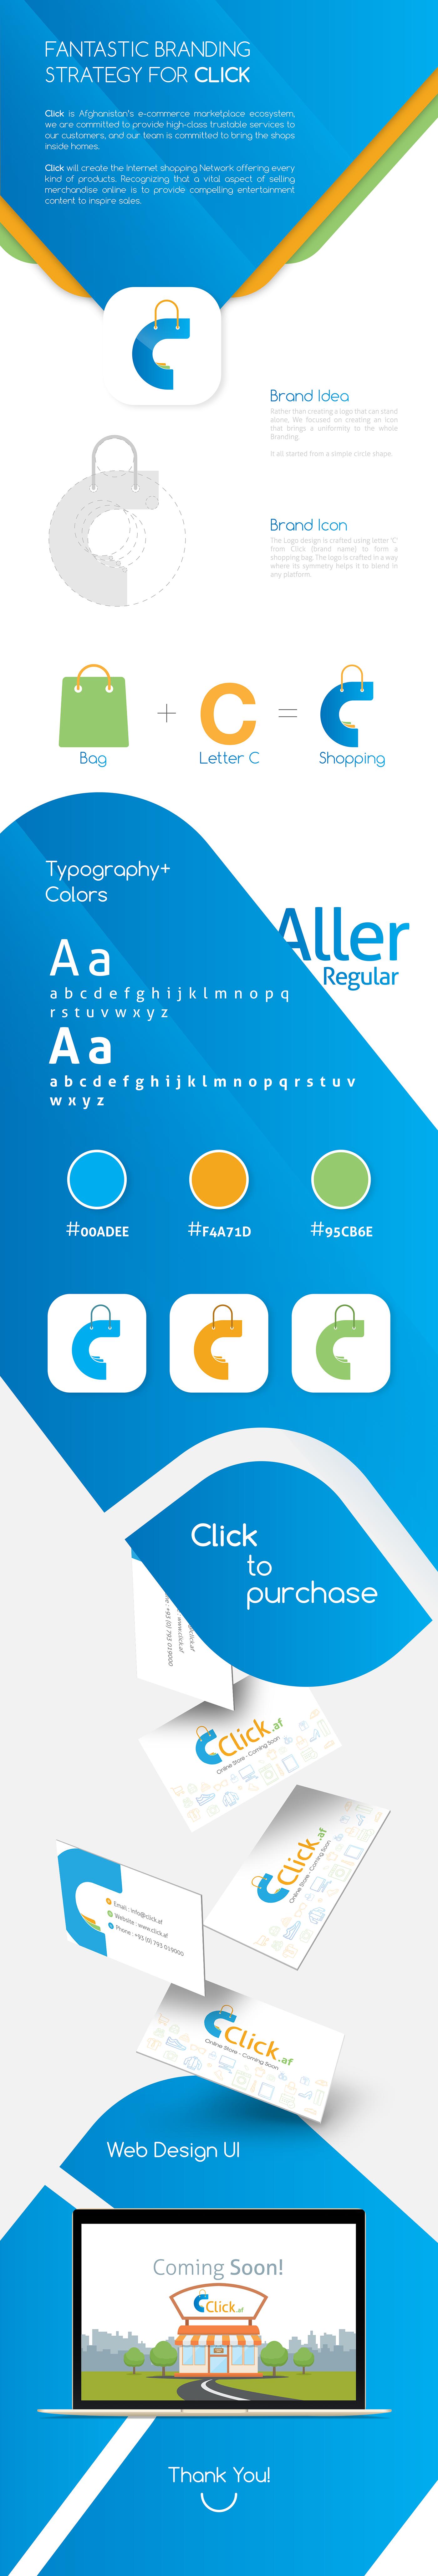 branding ,Webdesign,UI